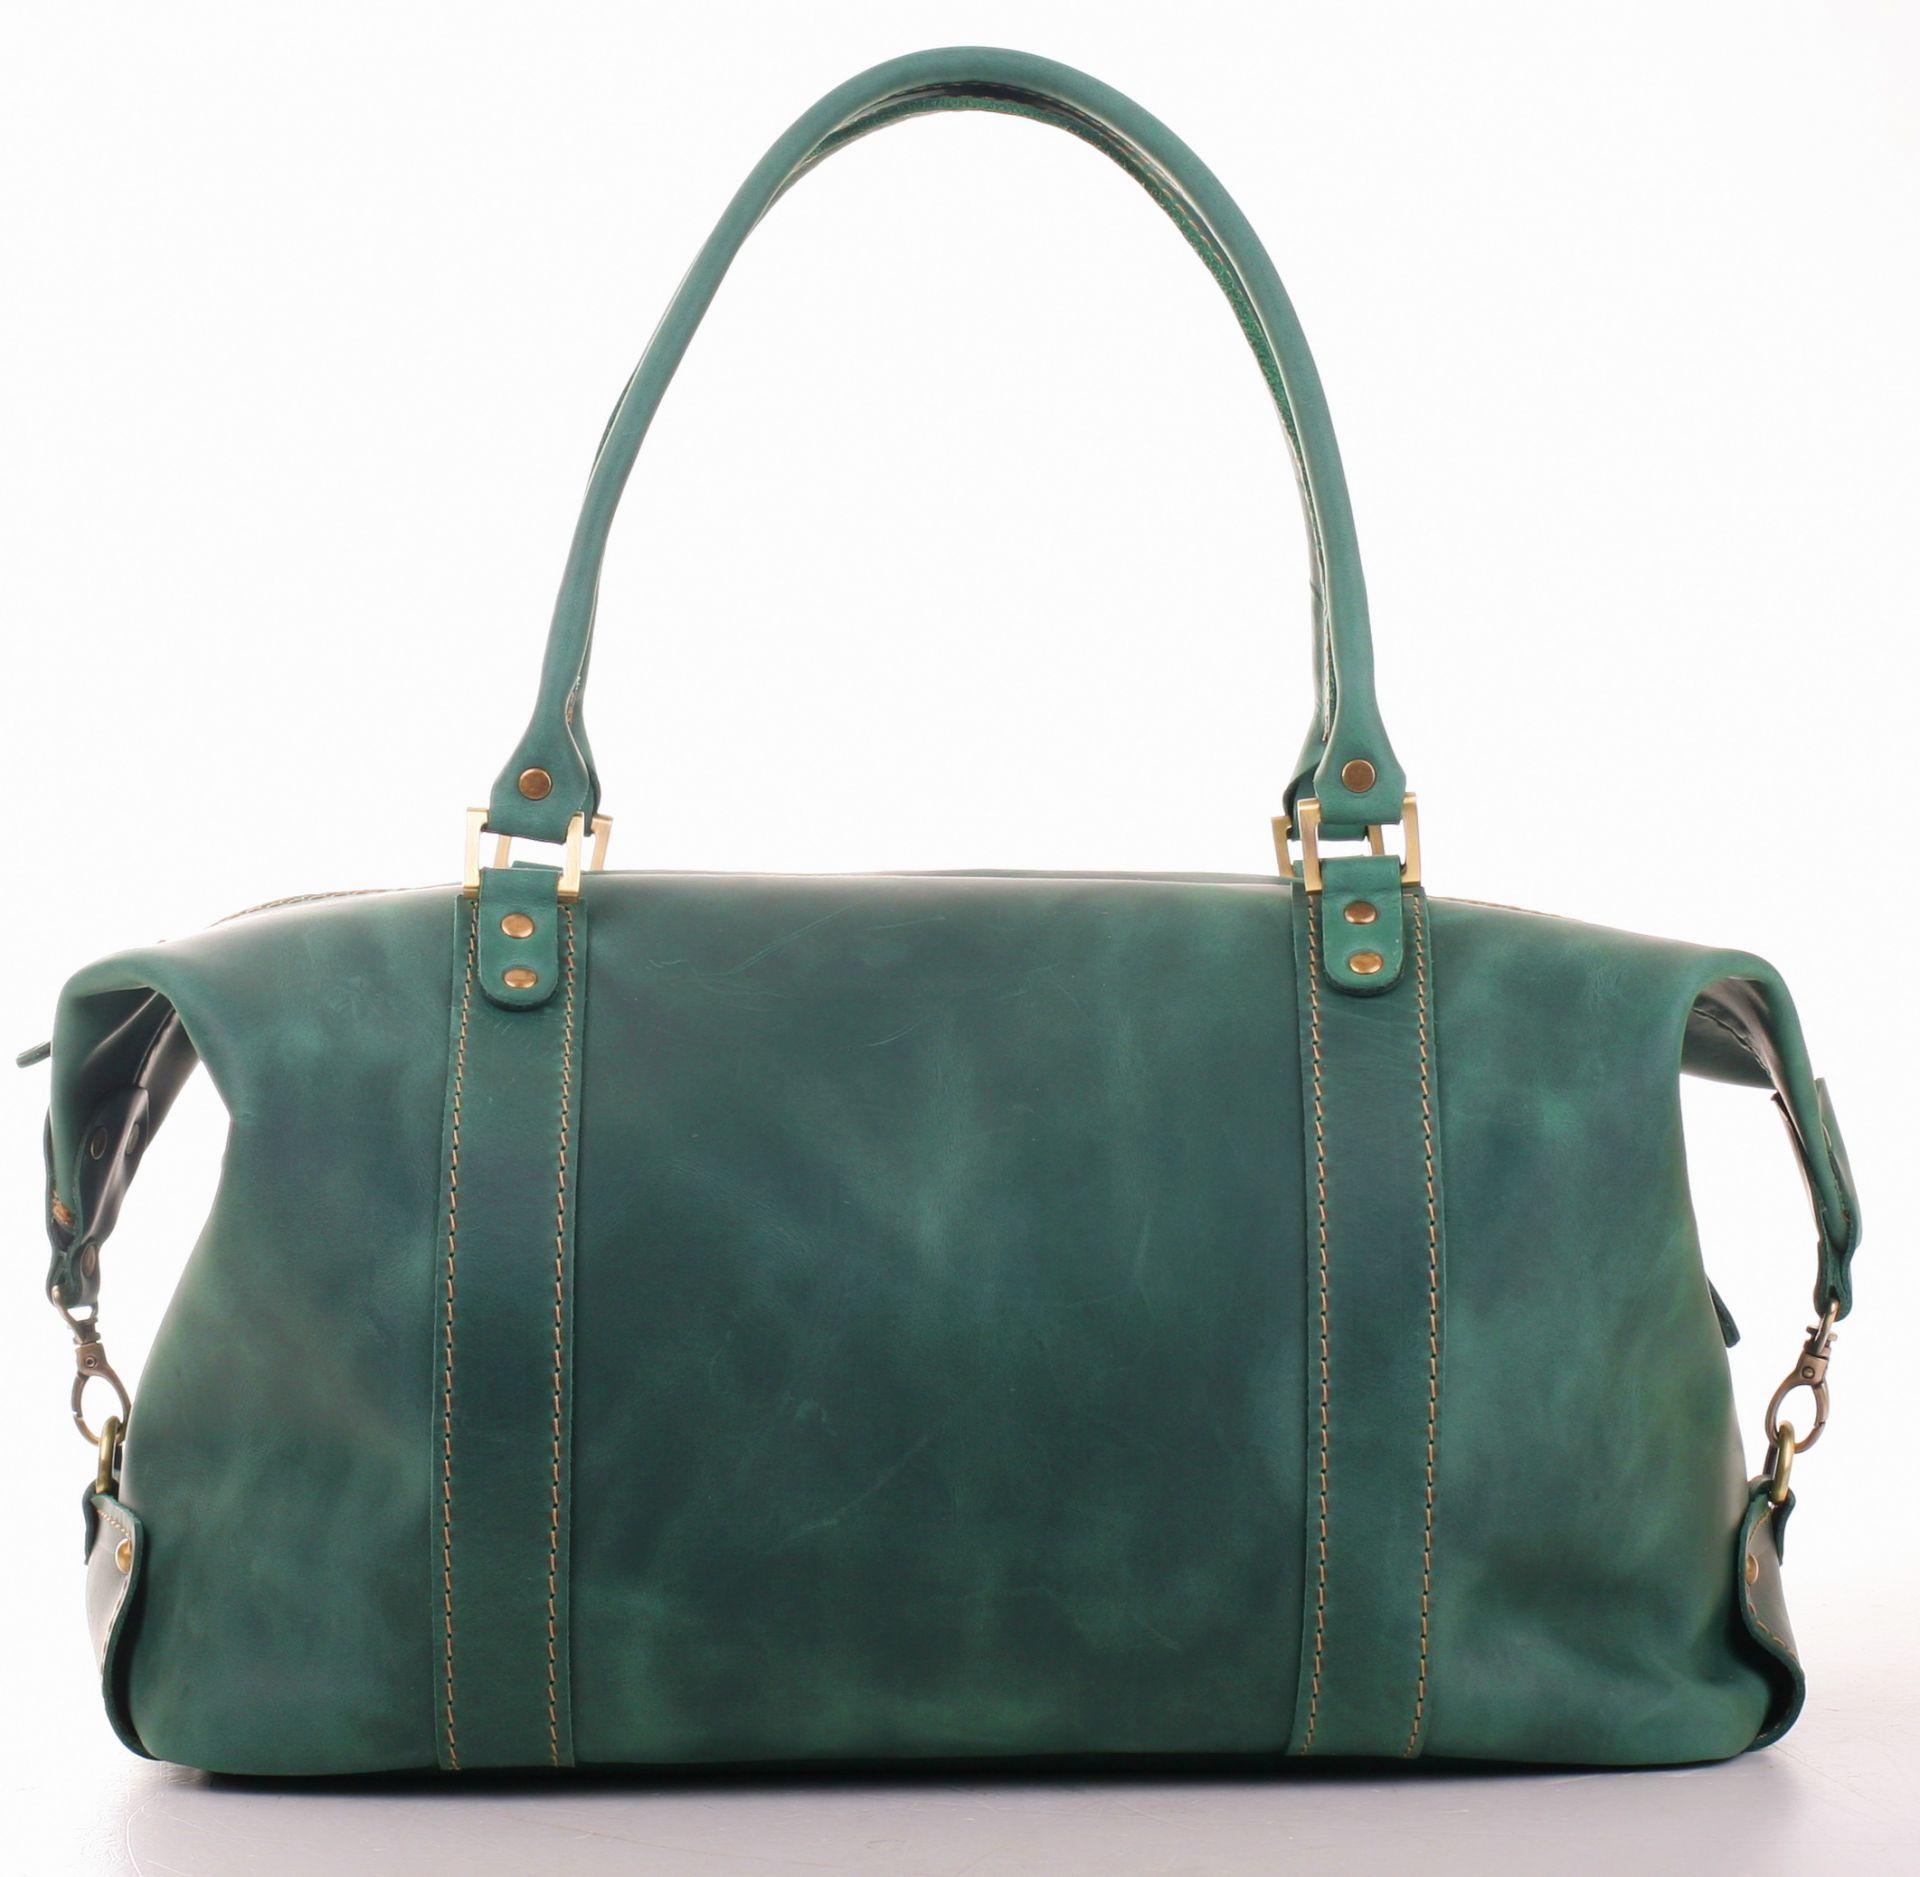 239f212935b6 Кожаная сумка дорожно-спортивная в винтаж стиле - Travel Leather Bag  (414-8811)